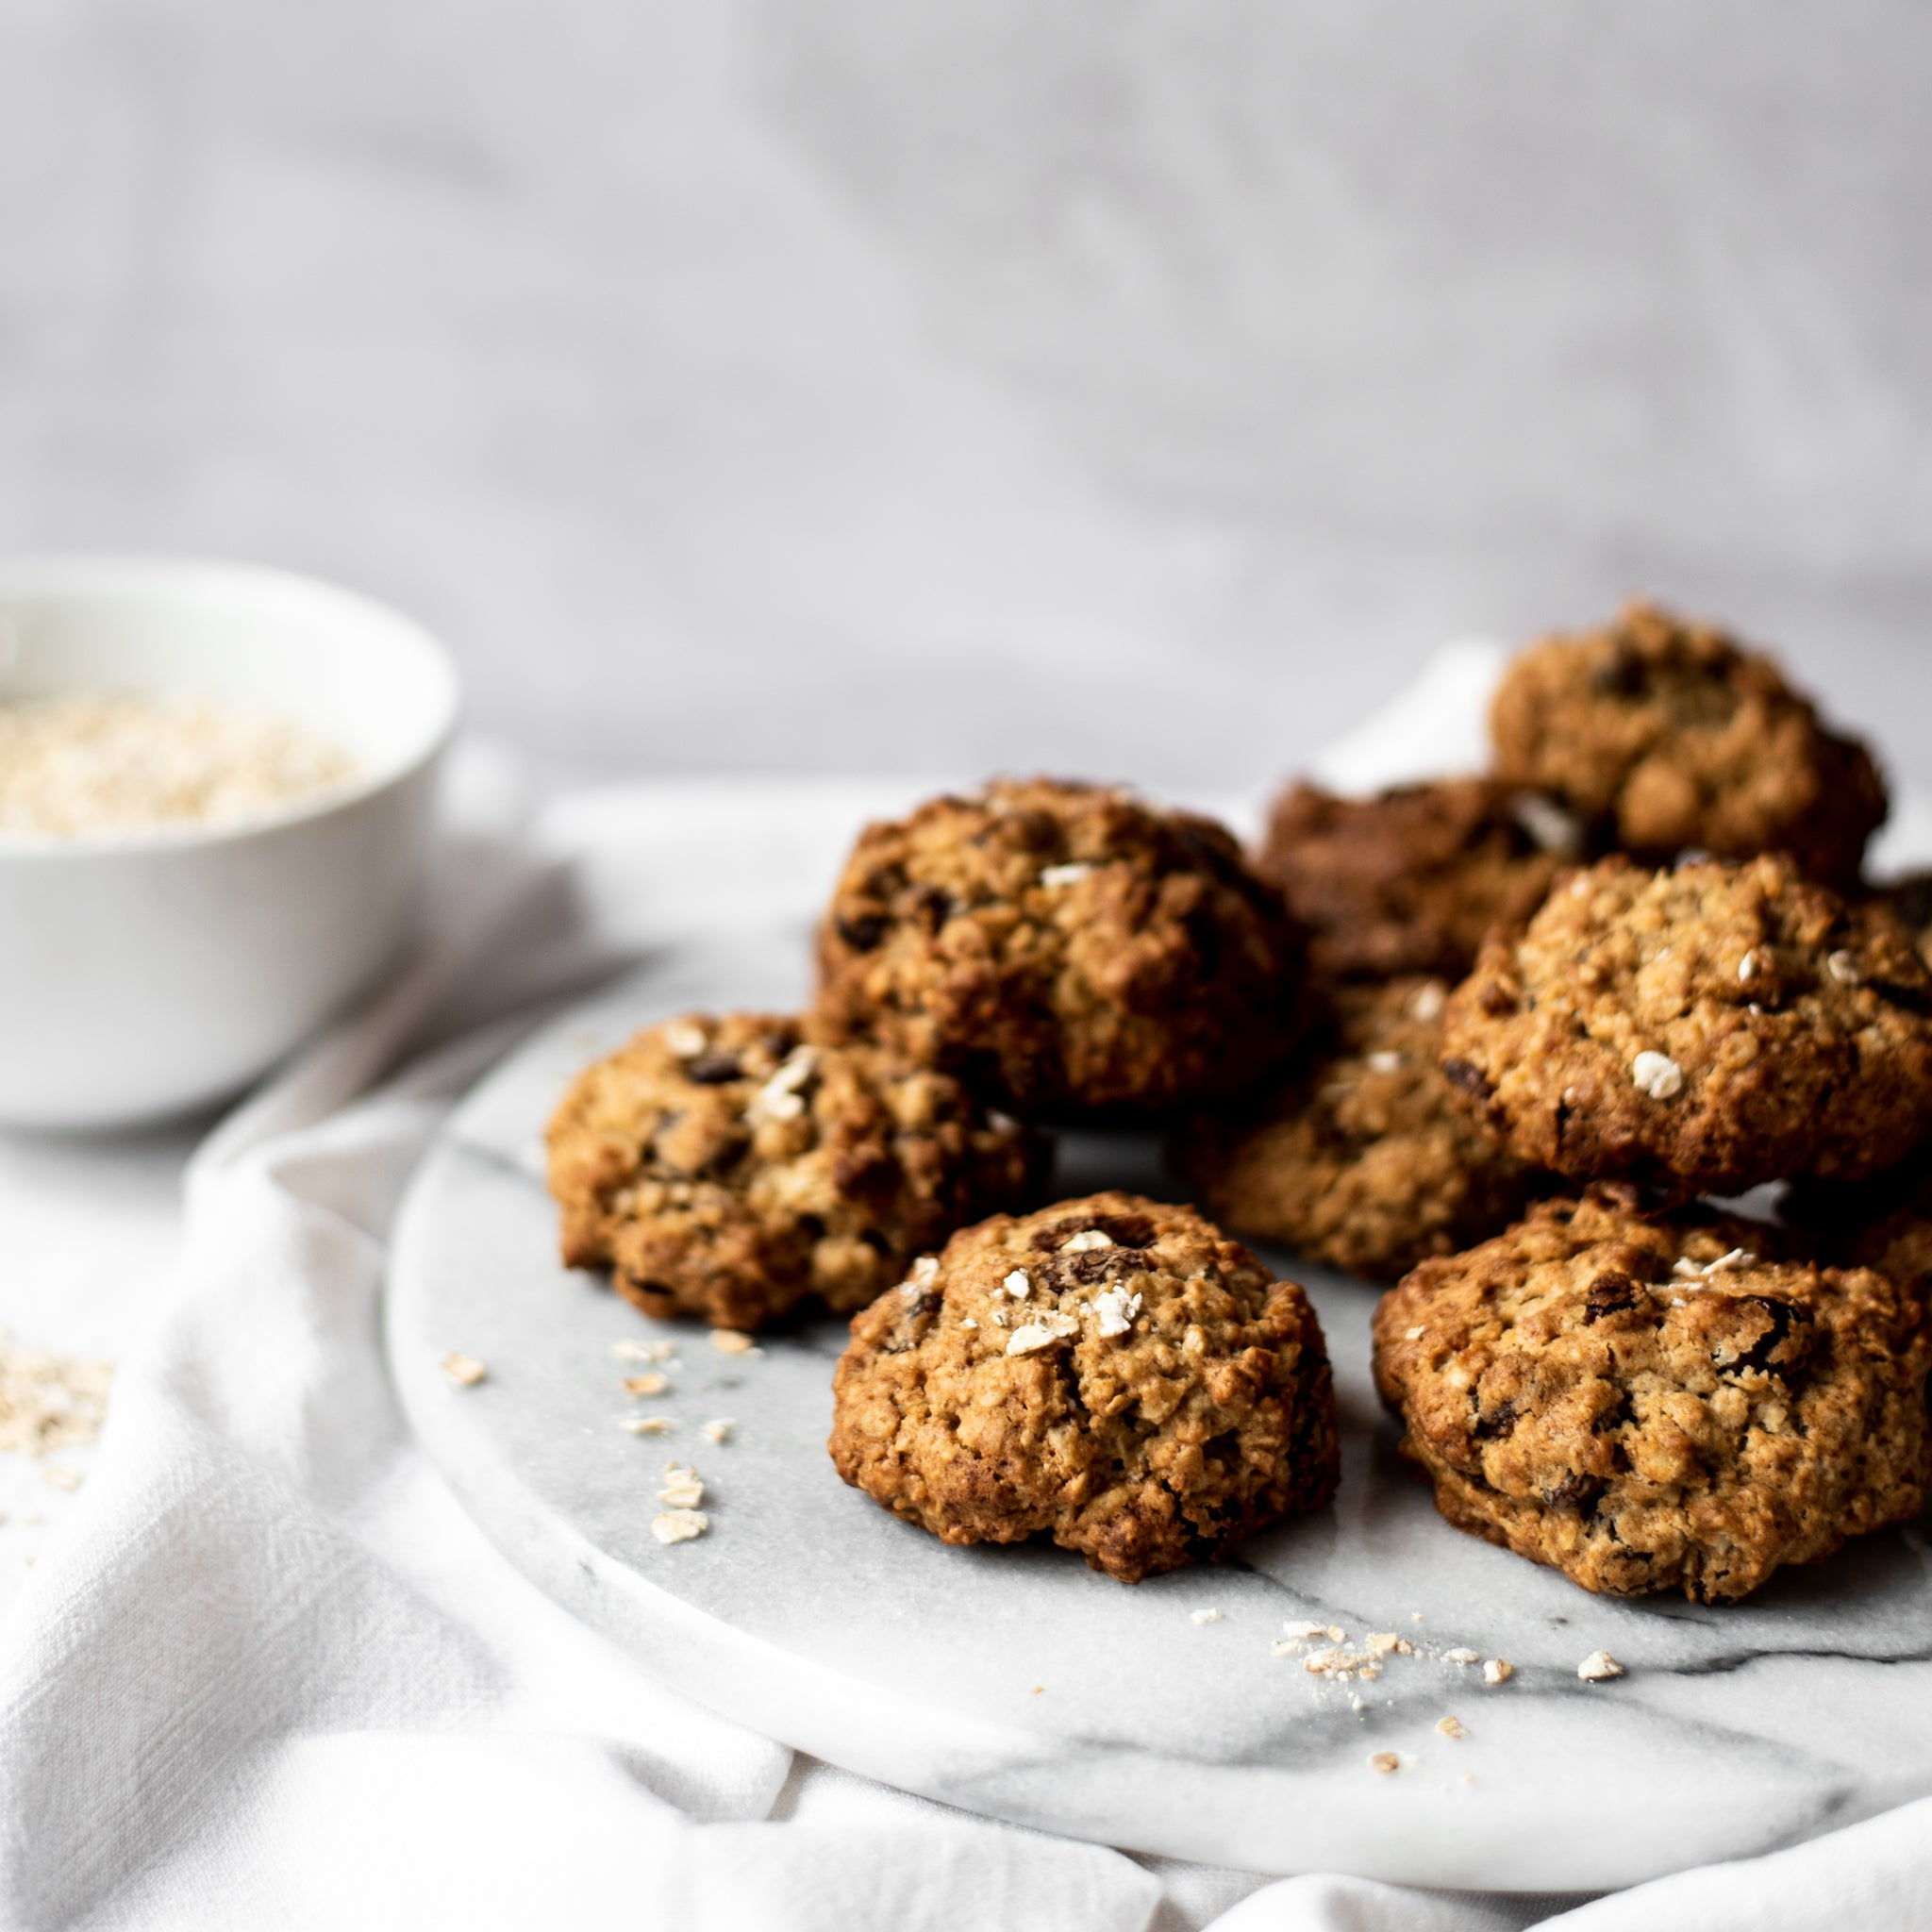 Oatmeal-Raisin-Cookies-SQUARE-4.jpg